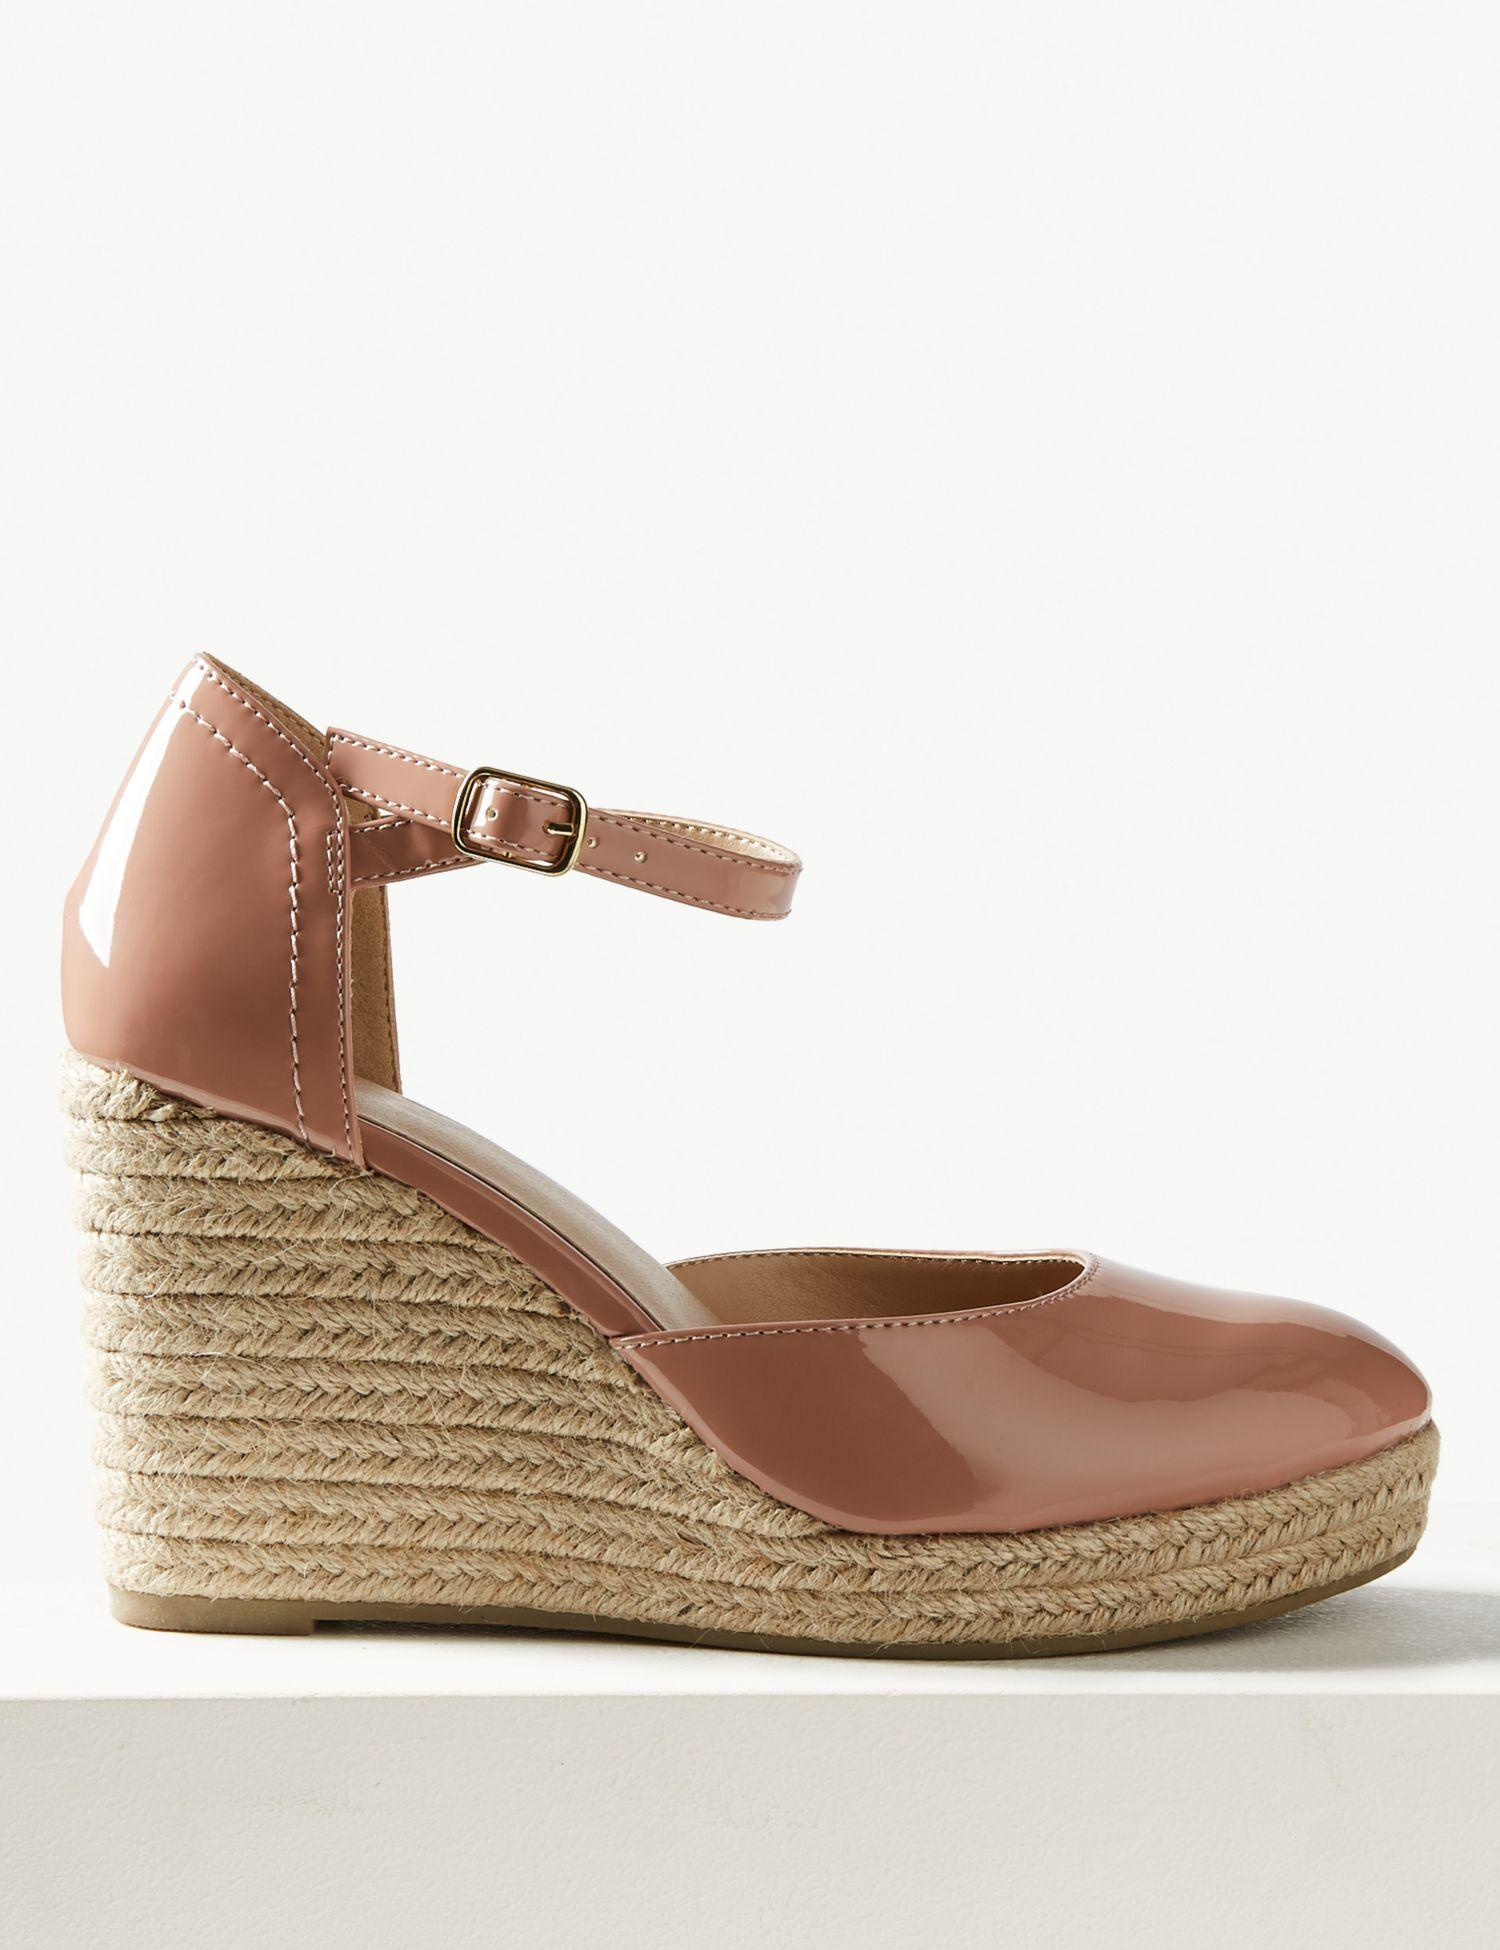 eceff443902 Marks & Spencer Wedge Heel Almond Toe Espadrilles in Natural - Lyst